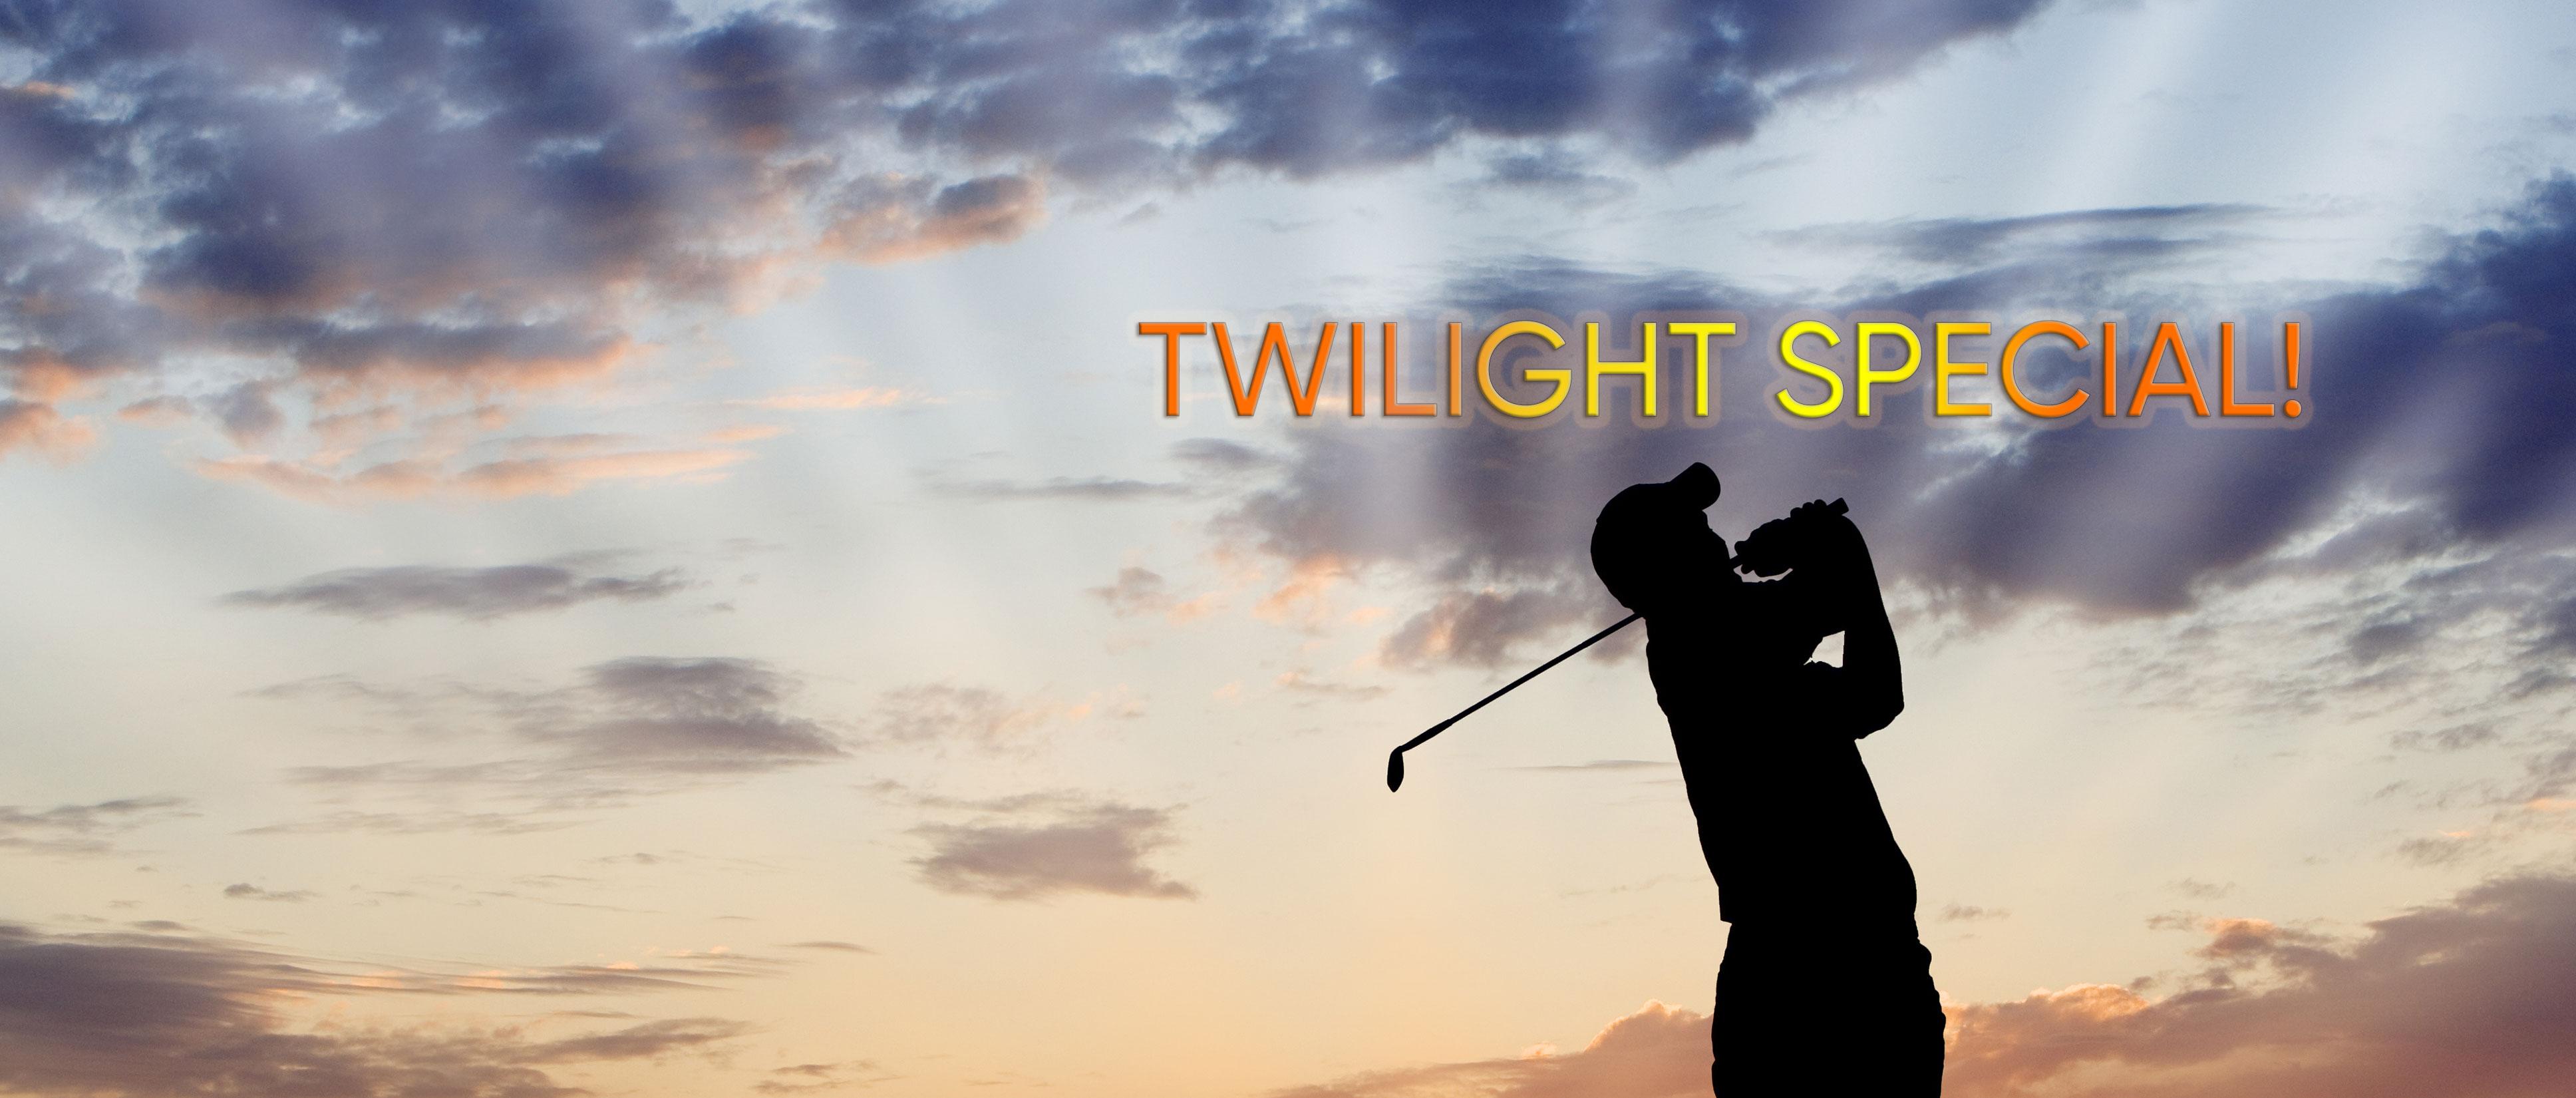 Twilight Special